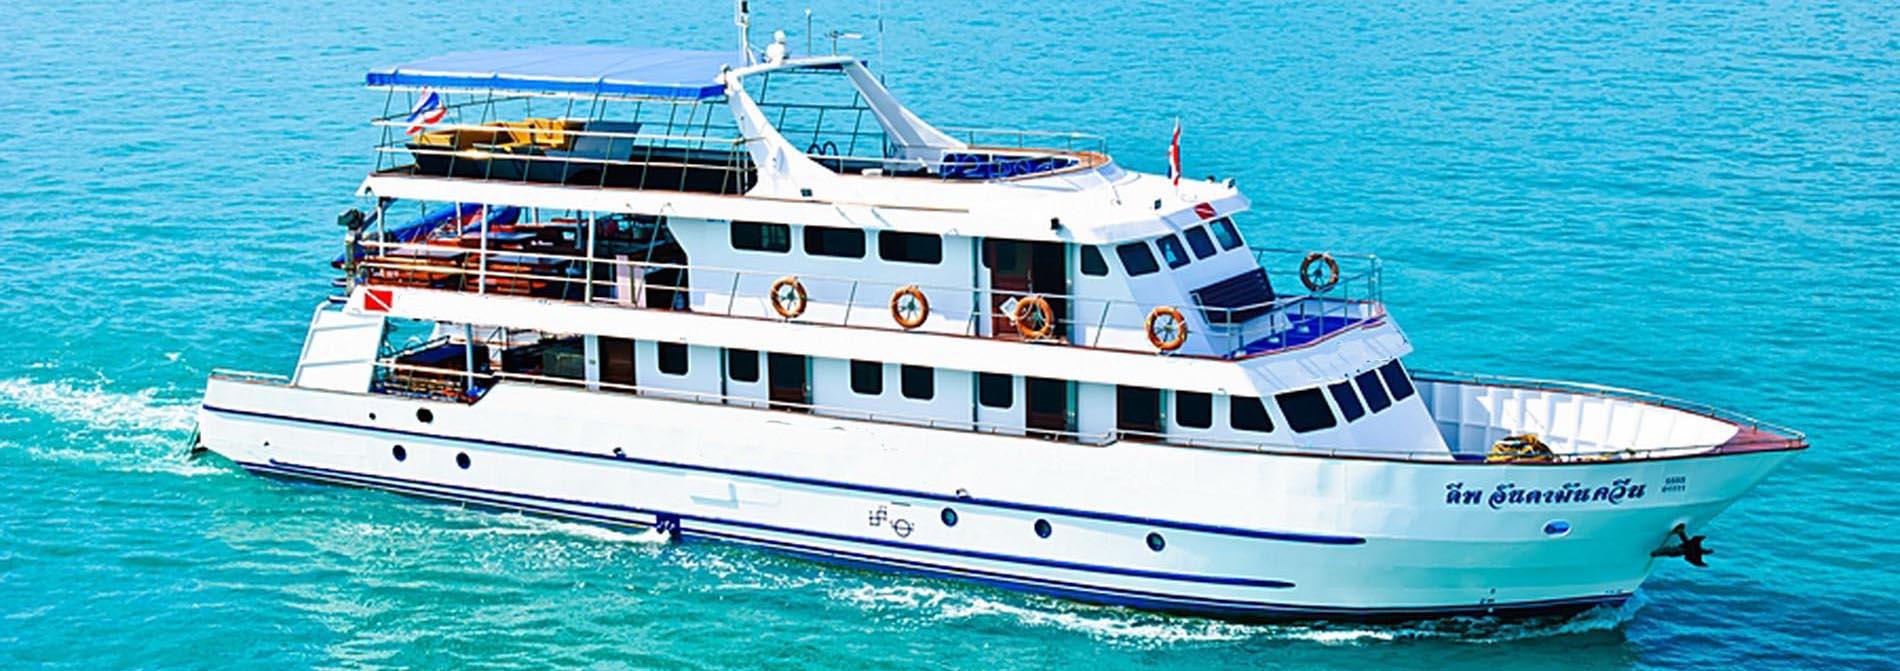 MV Andaman Queen - Phuket Tauchsafaris